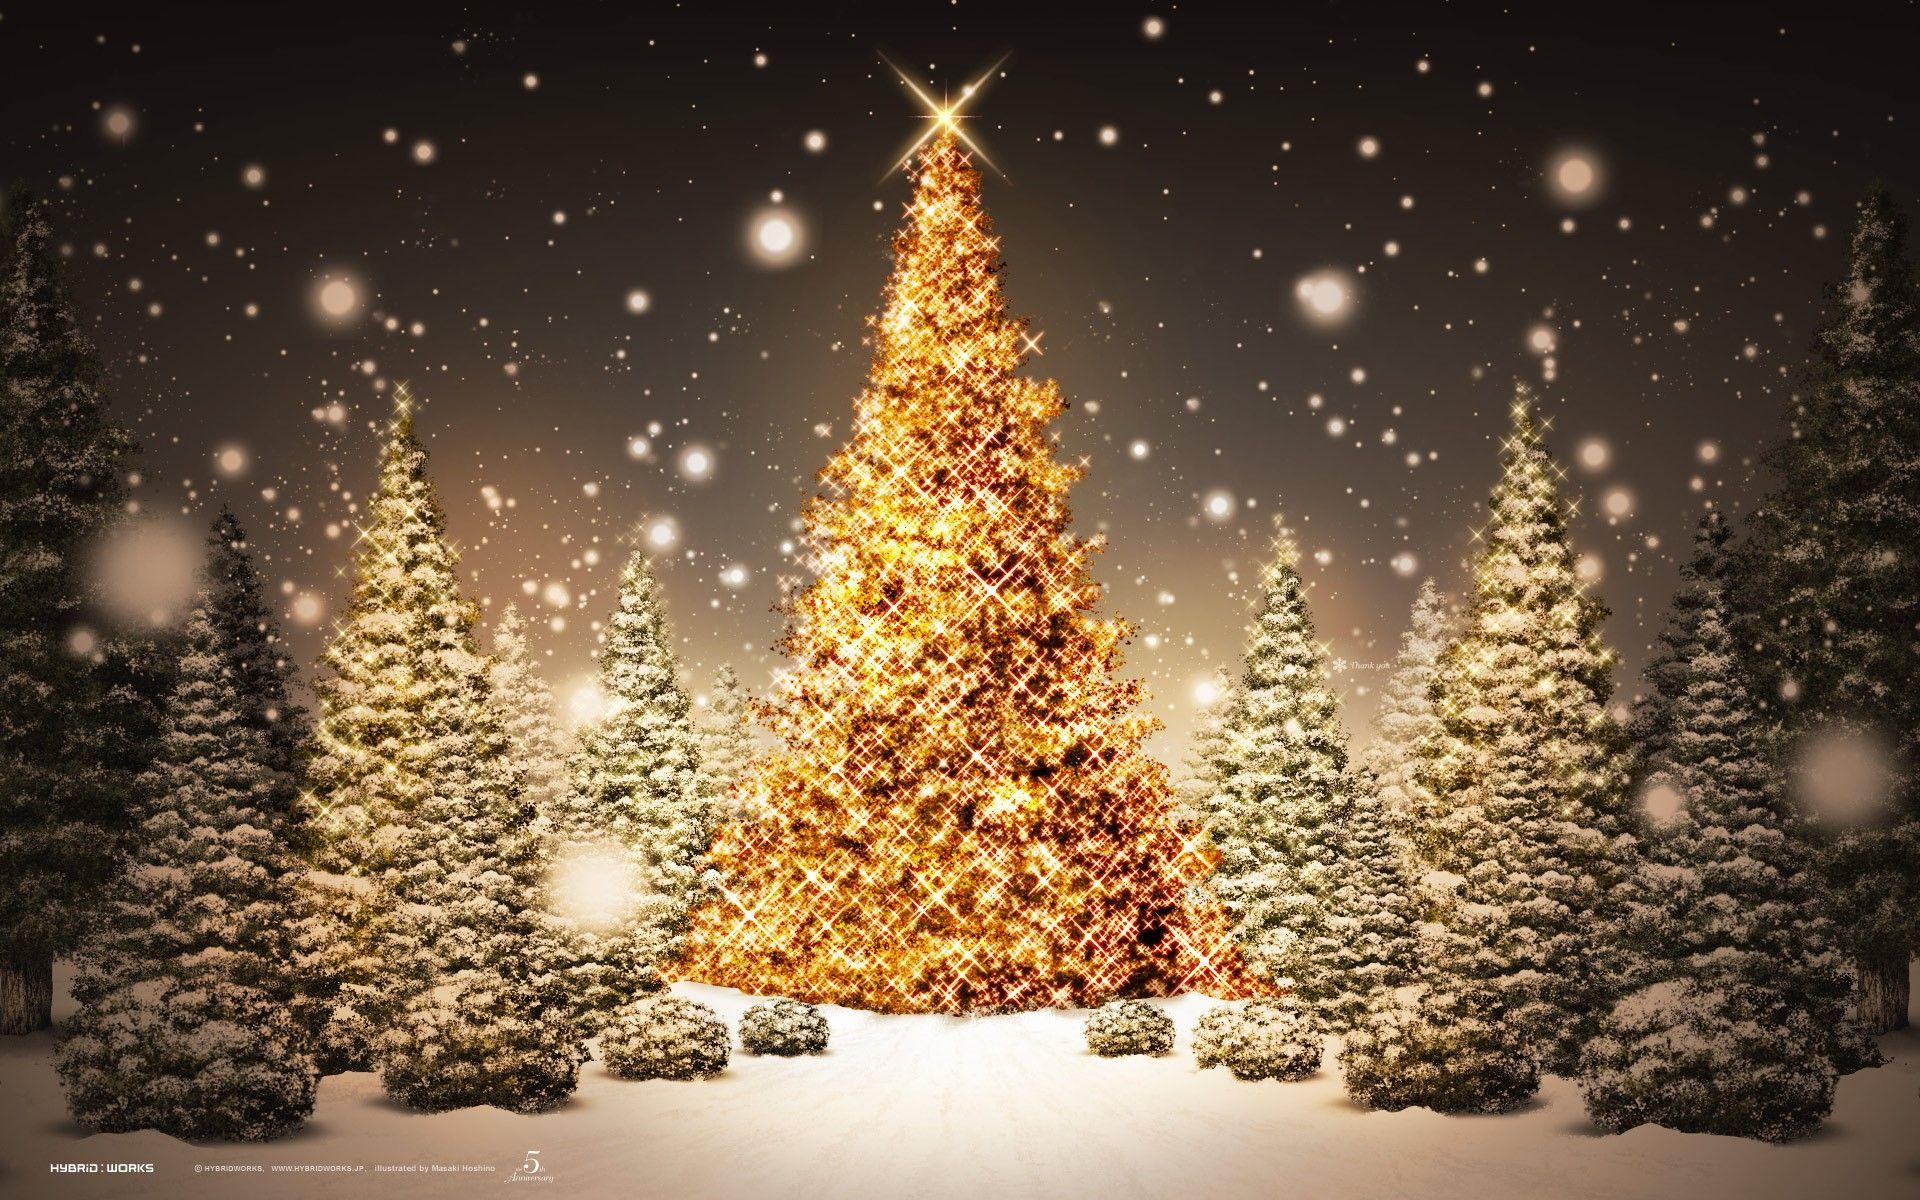 50 Beautiful Christmas Desktop Wallpapers Ginva Christmas Lights Wallpaper Christmas Wallpaper Hd Christmas Tree Wallpaper